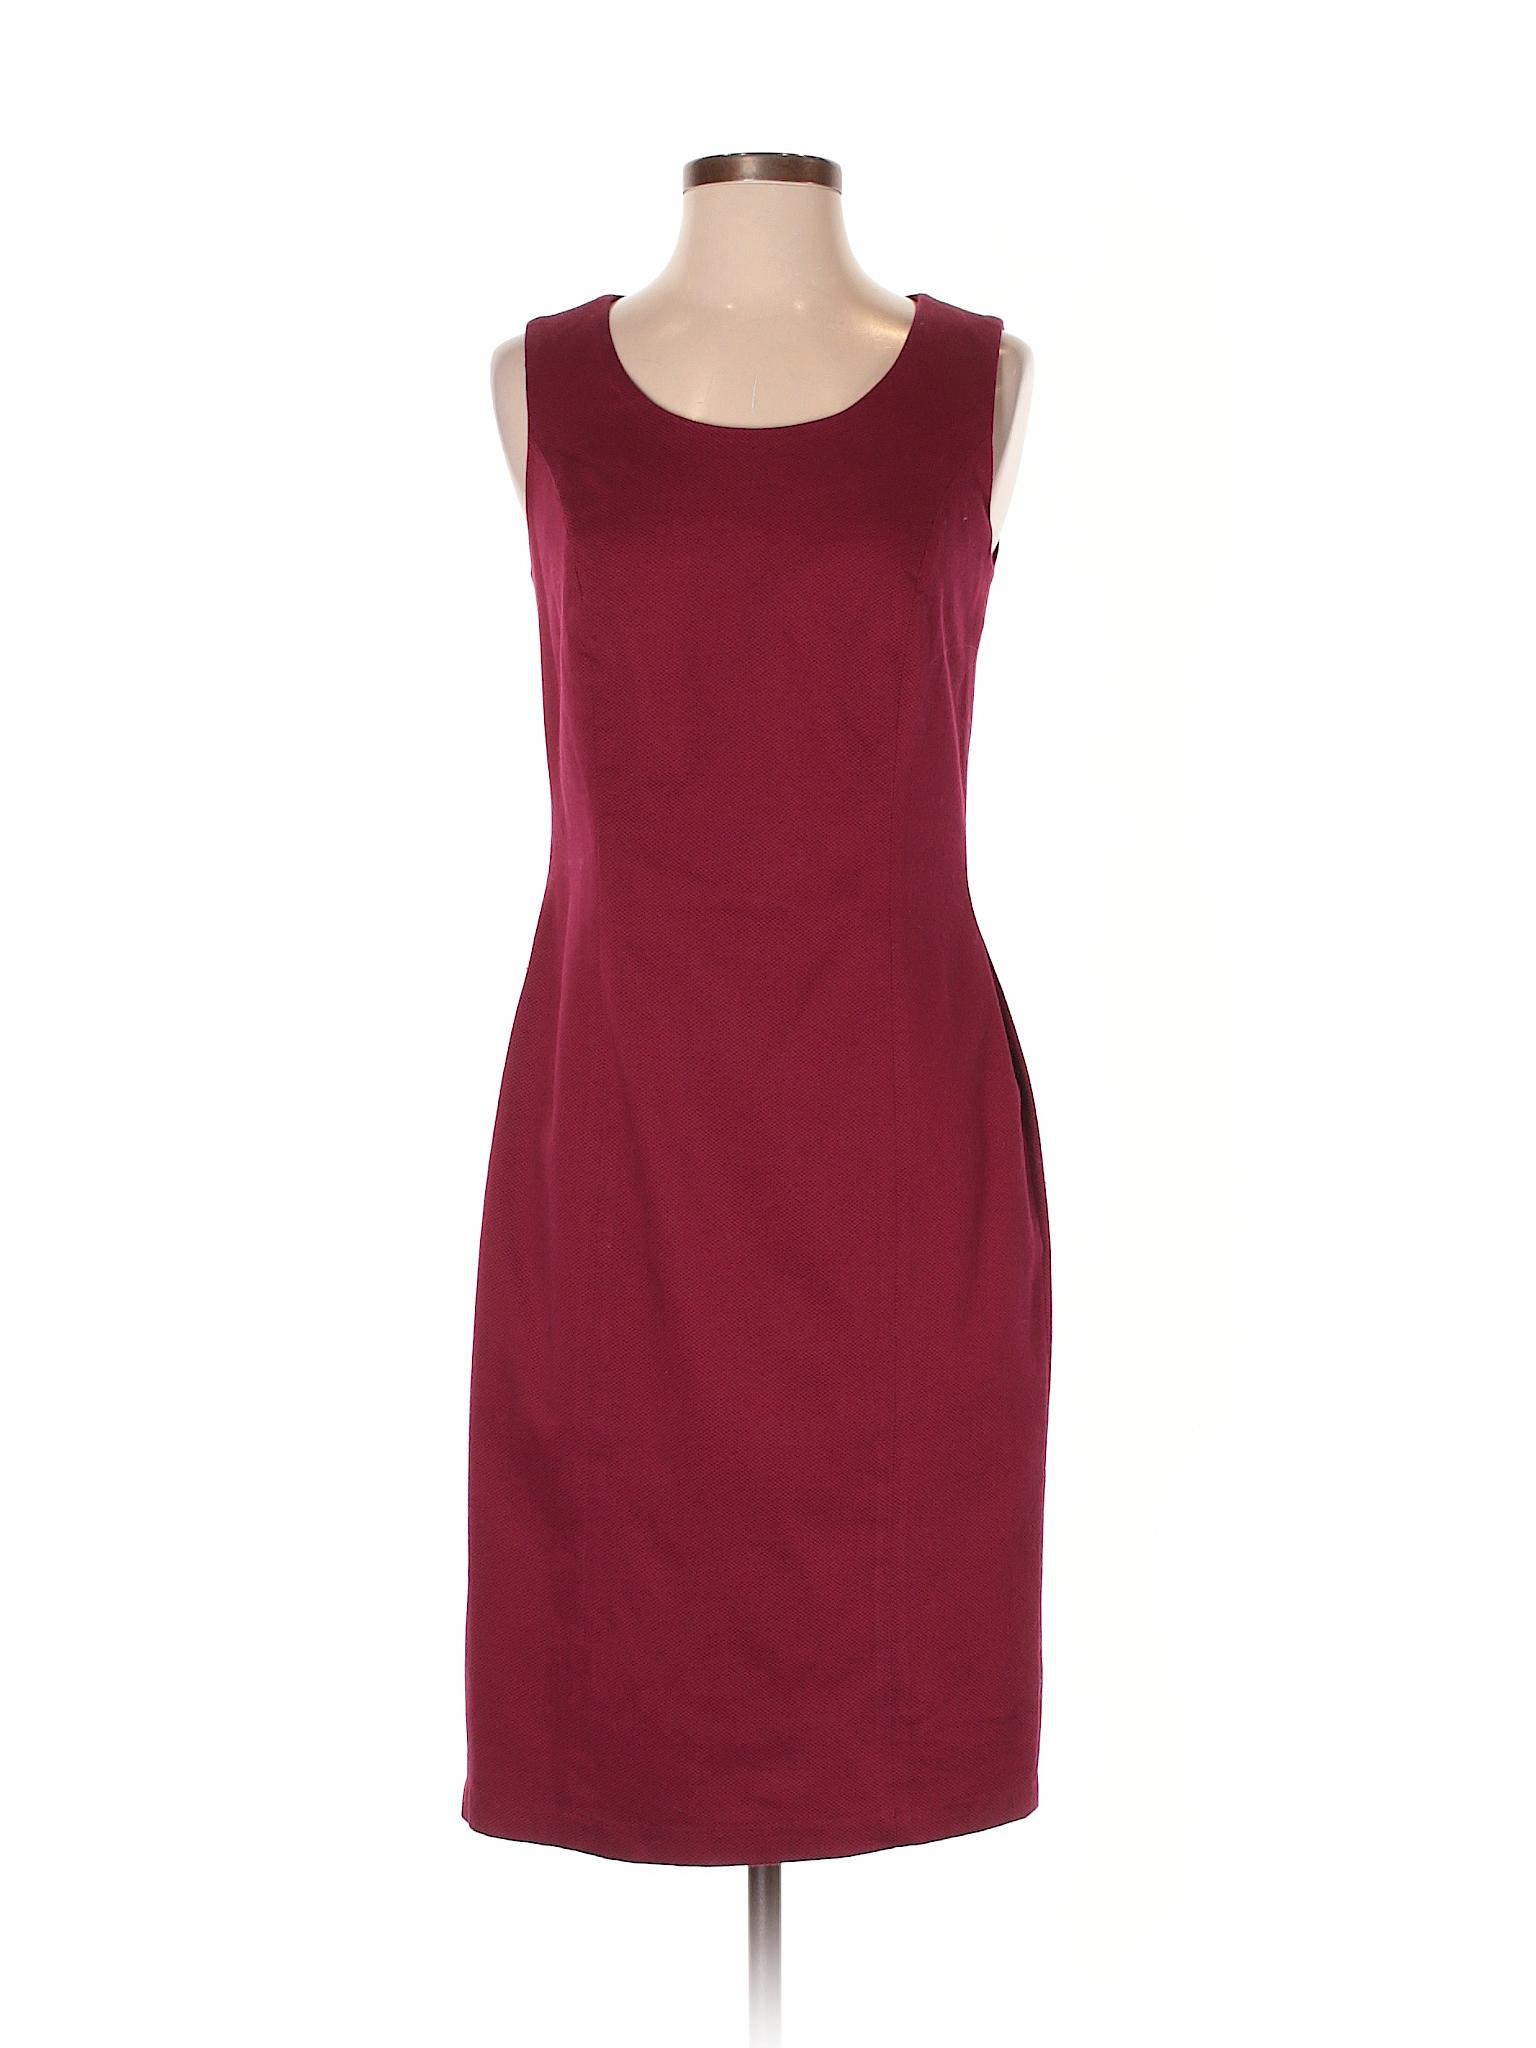 Casual winter Boutique winter Dress Spiegel Dress Spiegel Boutique Casual TSw5pqRx